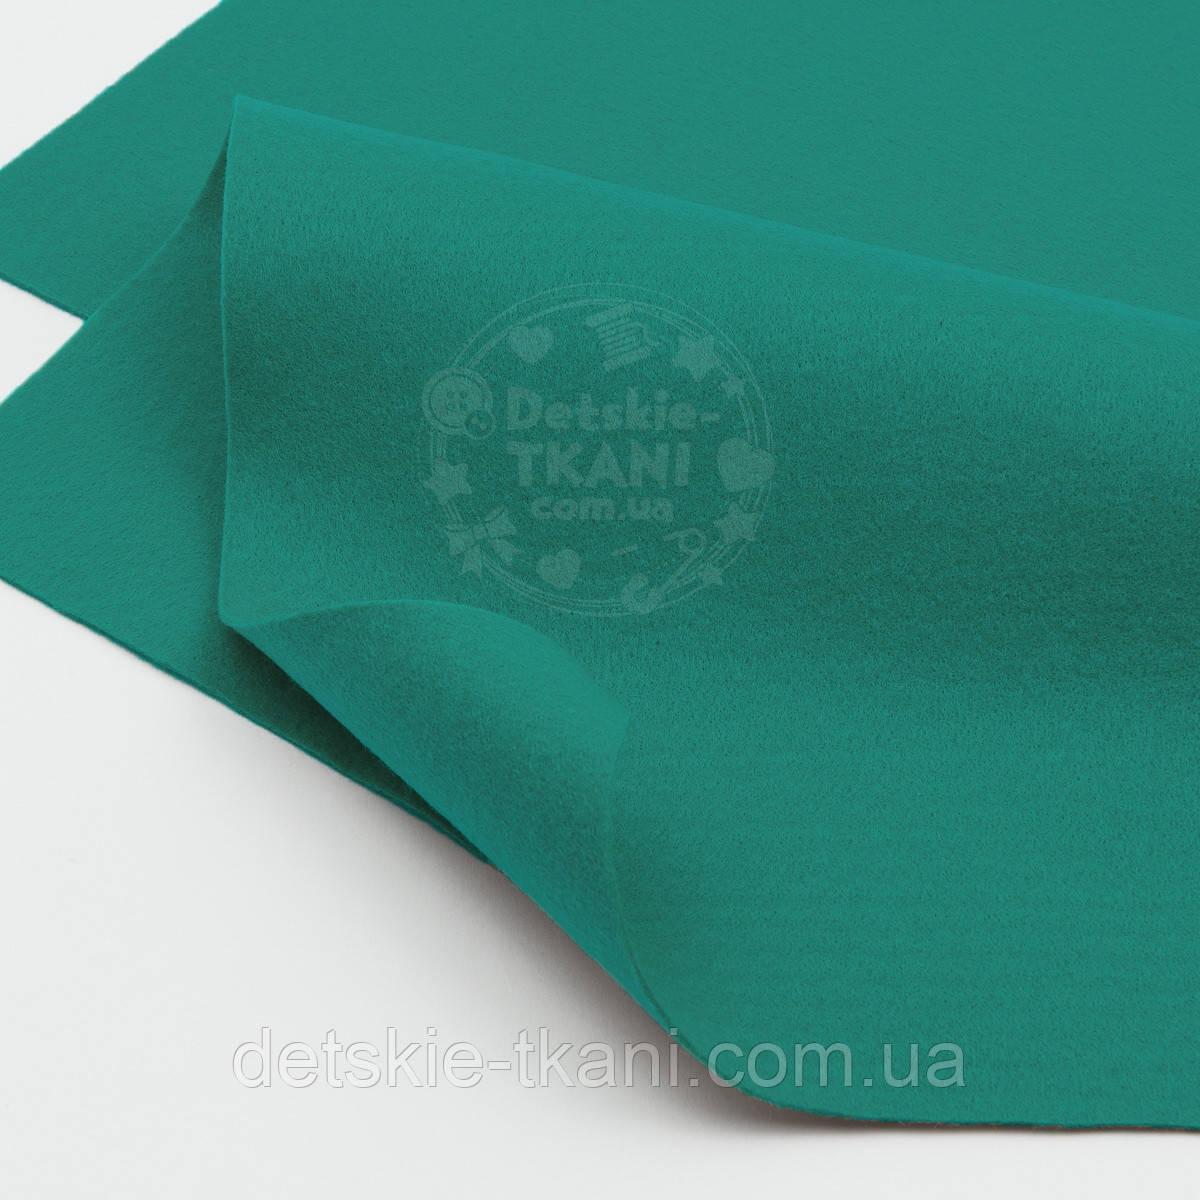 Мягкий листовой фетр тёмно-бирюзового цвета 20*30 см (ФМ-27)